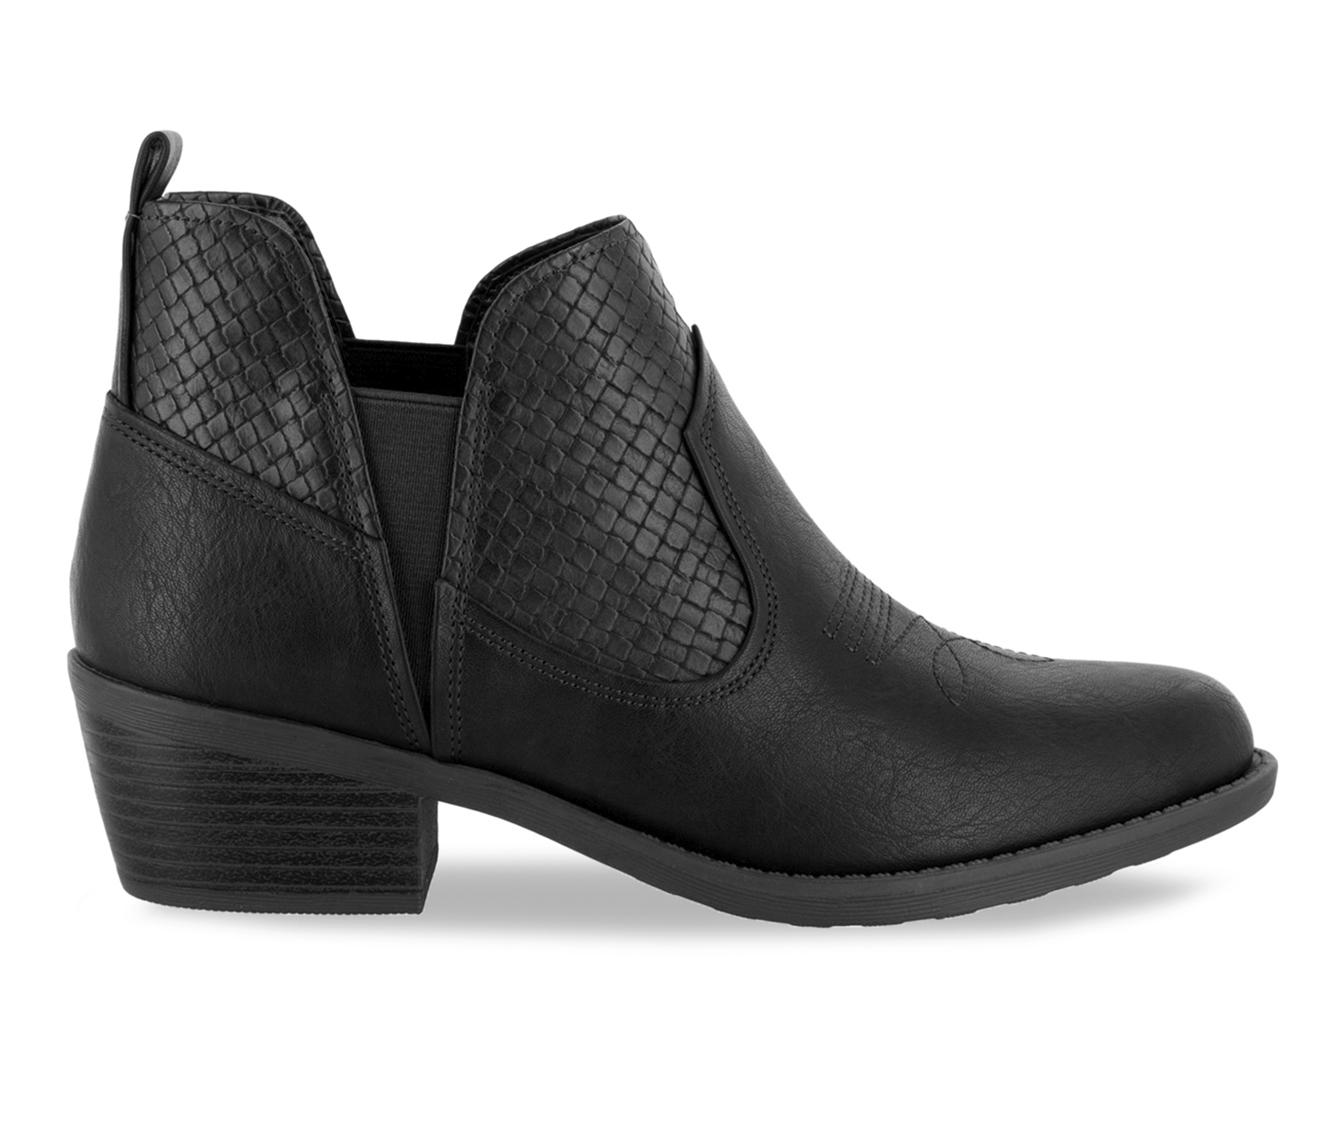 Easy Street Legend Women's Boots (Black - Faux Leather)